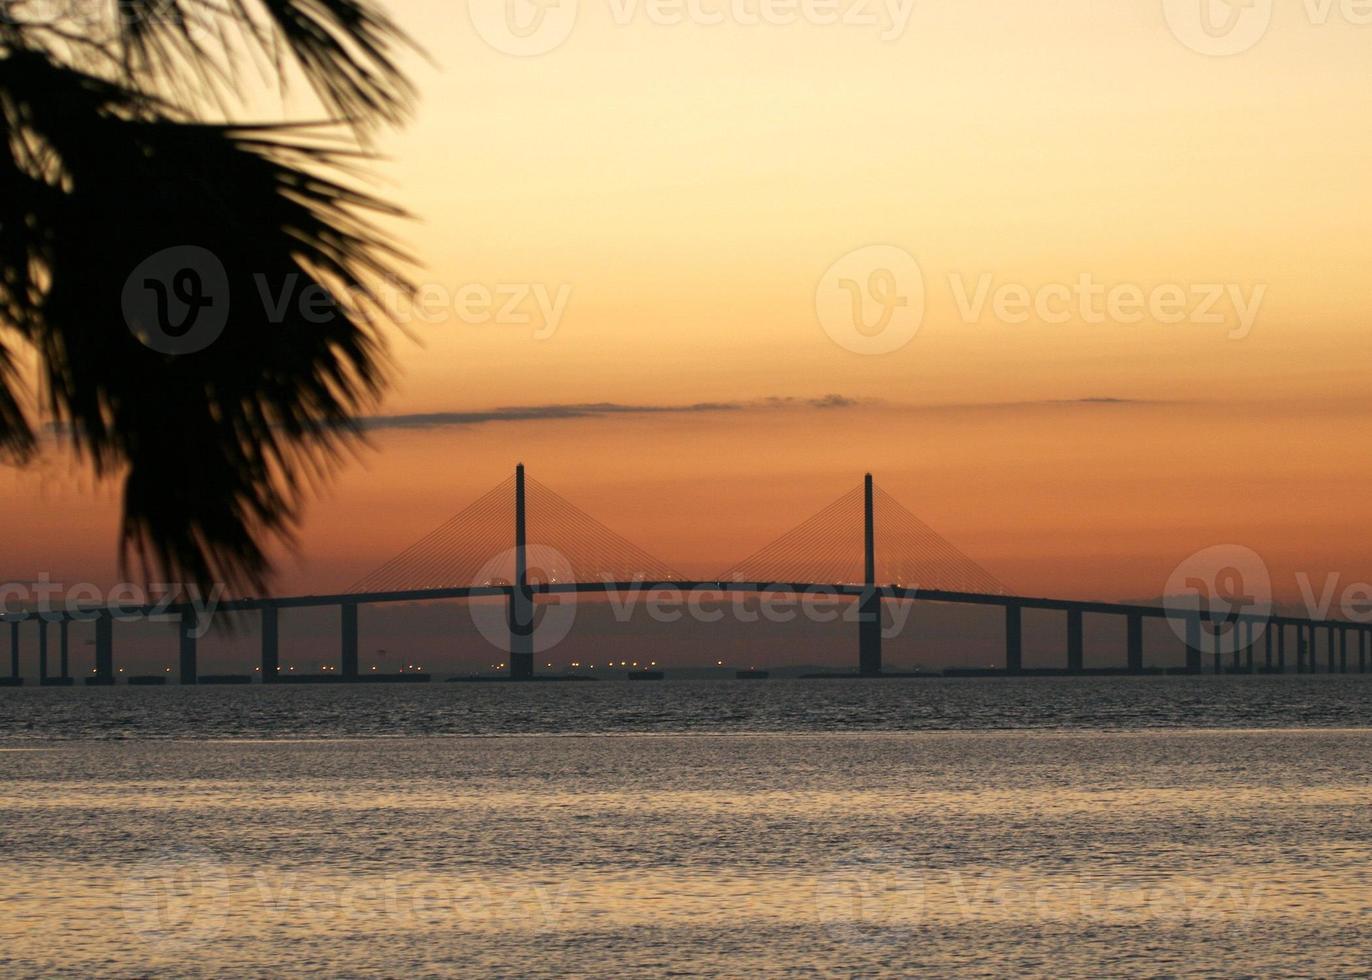 Tampa Bay Skyway Brücke bei Sonnenaufgang foto